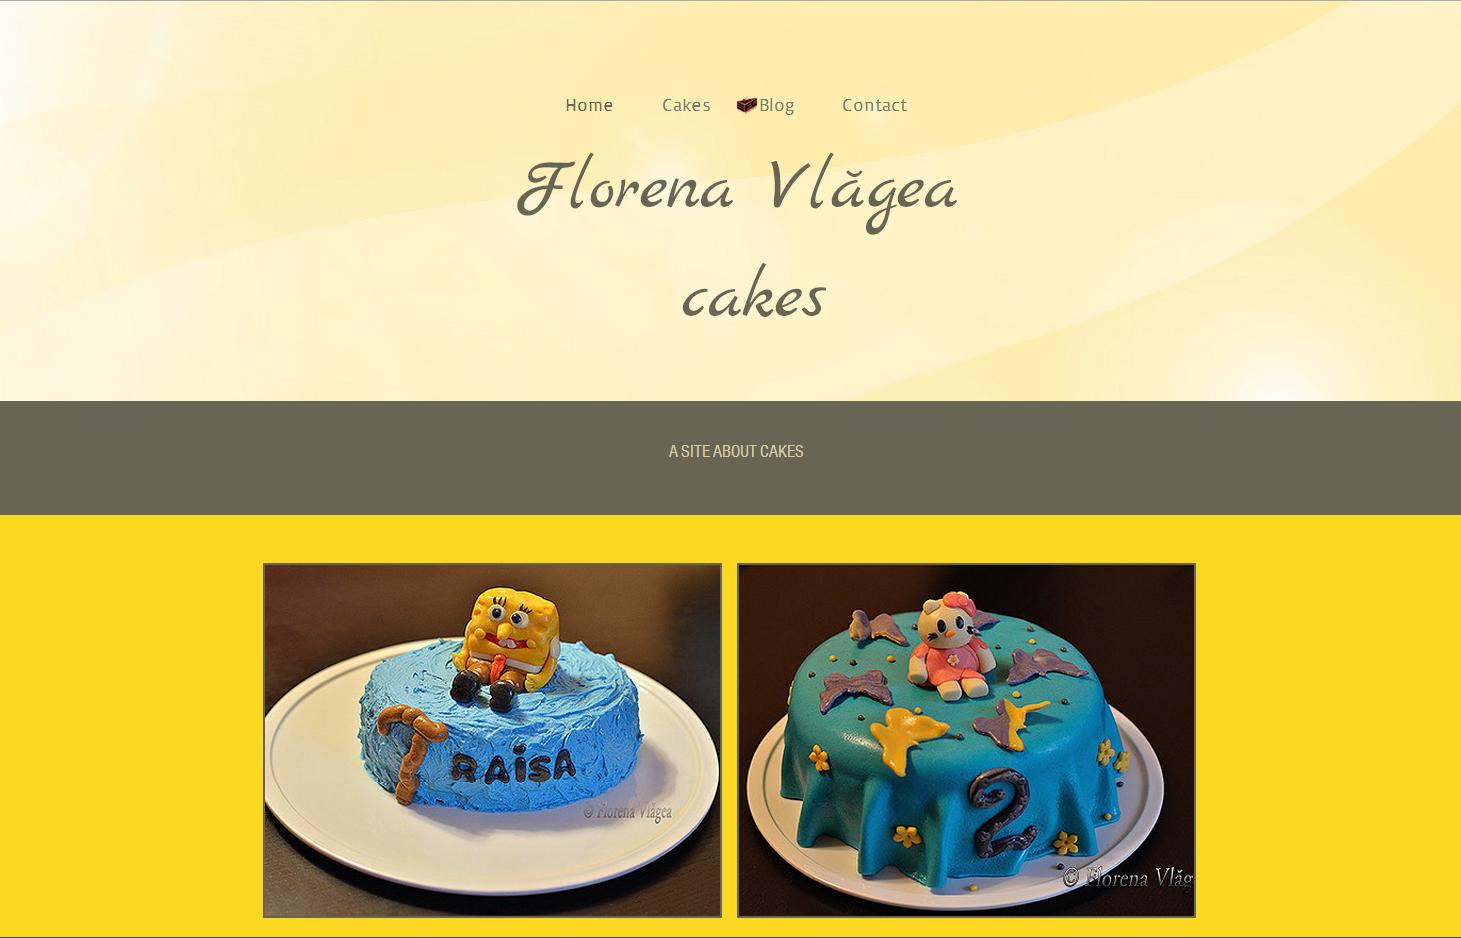 Site-ul FlorenaCakes